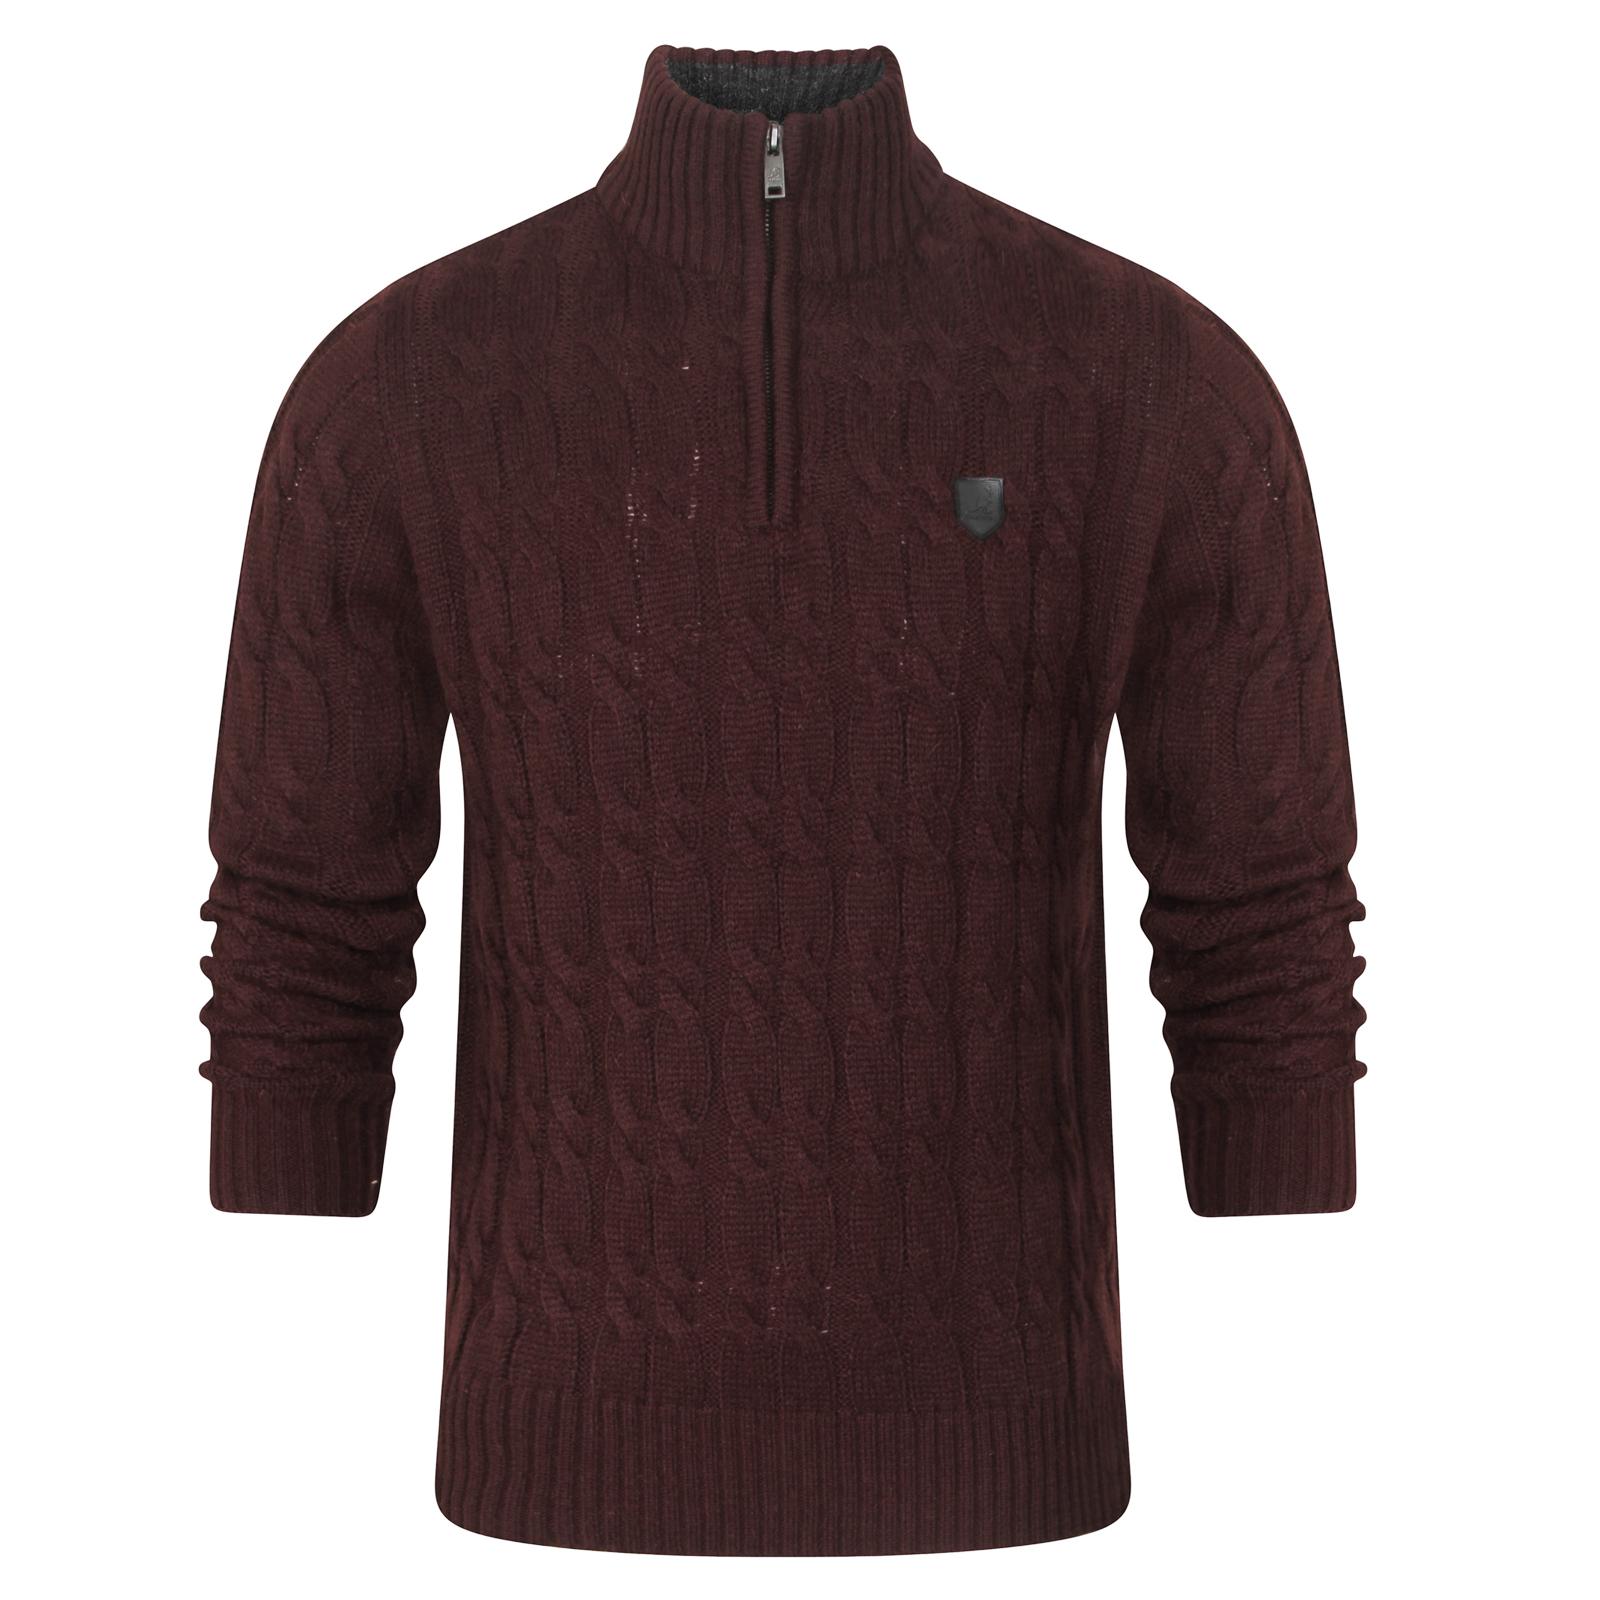 Kangol-Taras-Mens-Designer-Sweater-Zip-Up-Funnel-Neck-Pullover-Cable-Knit-Jumper